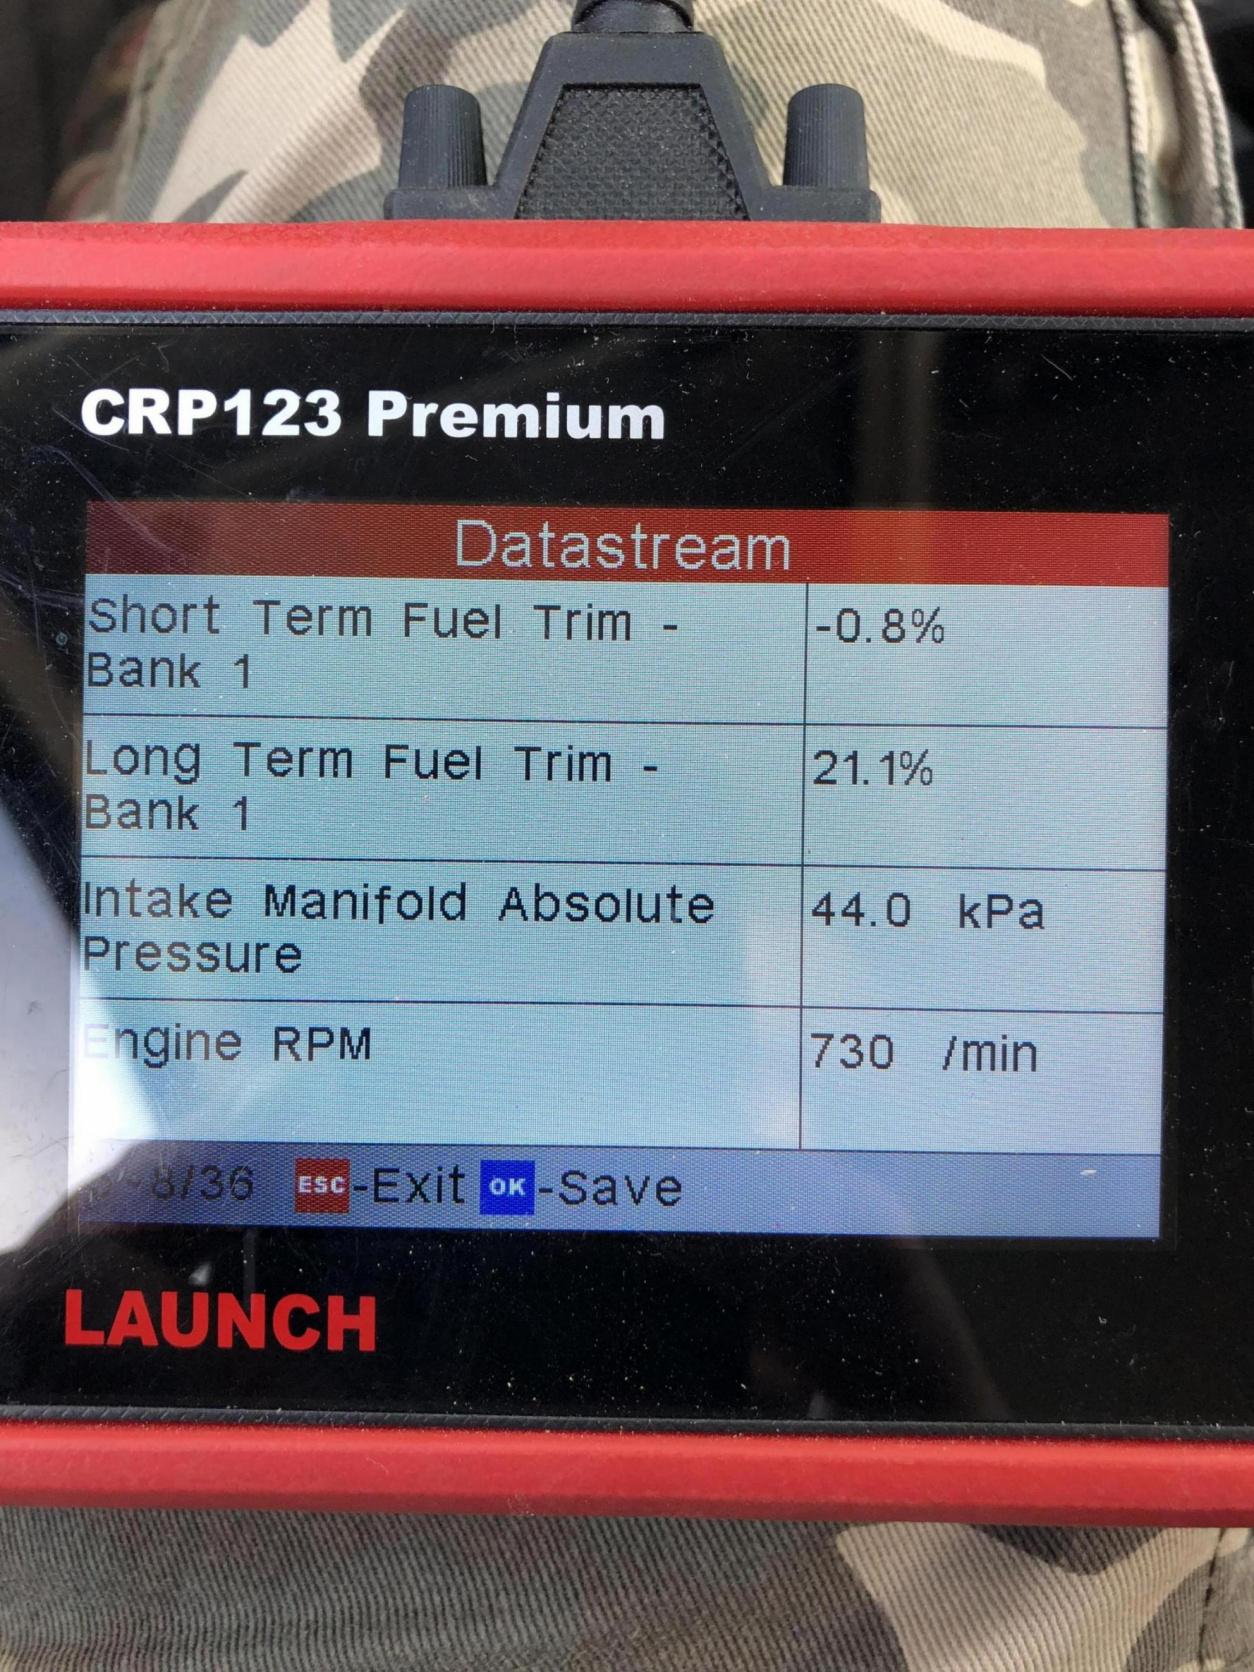 Code P0171 System too Lean. (not the PCV hose)-64eff1ec-fa9d-4609-8fef-14e380e6fc7d_1561676445244.jpg